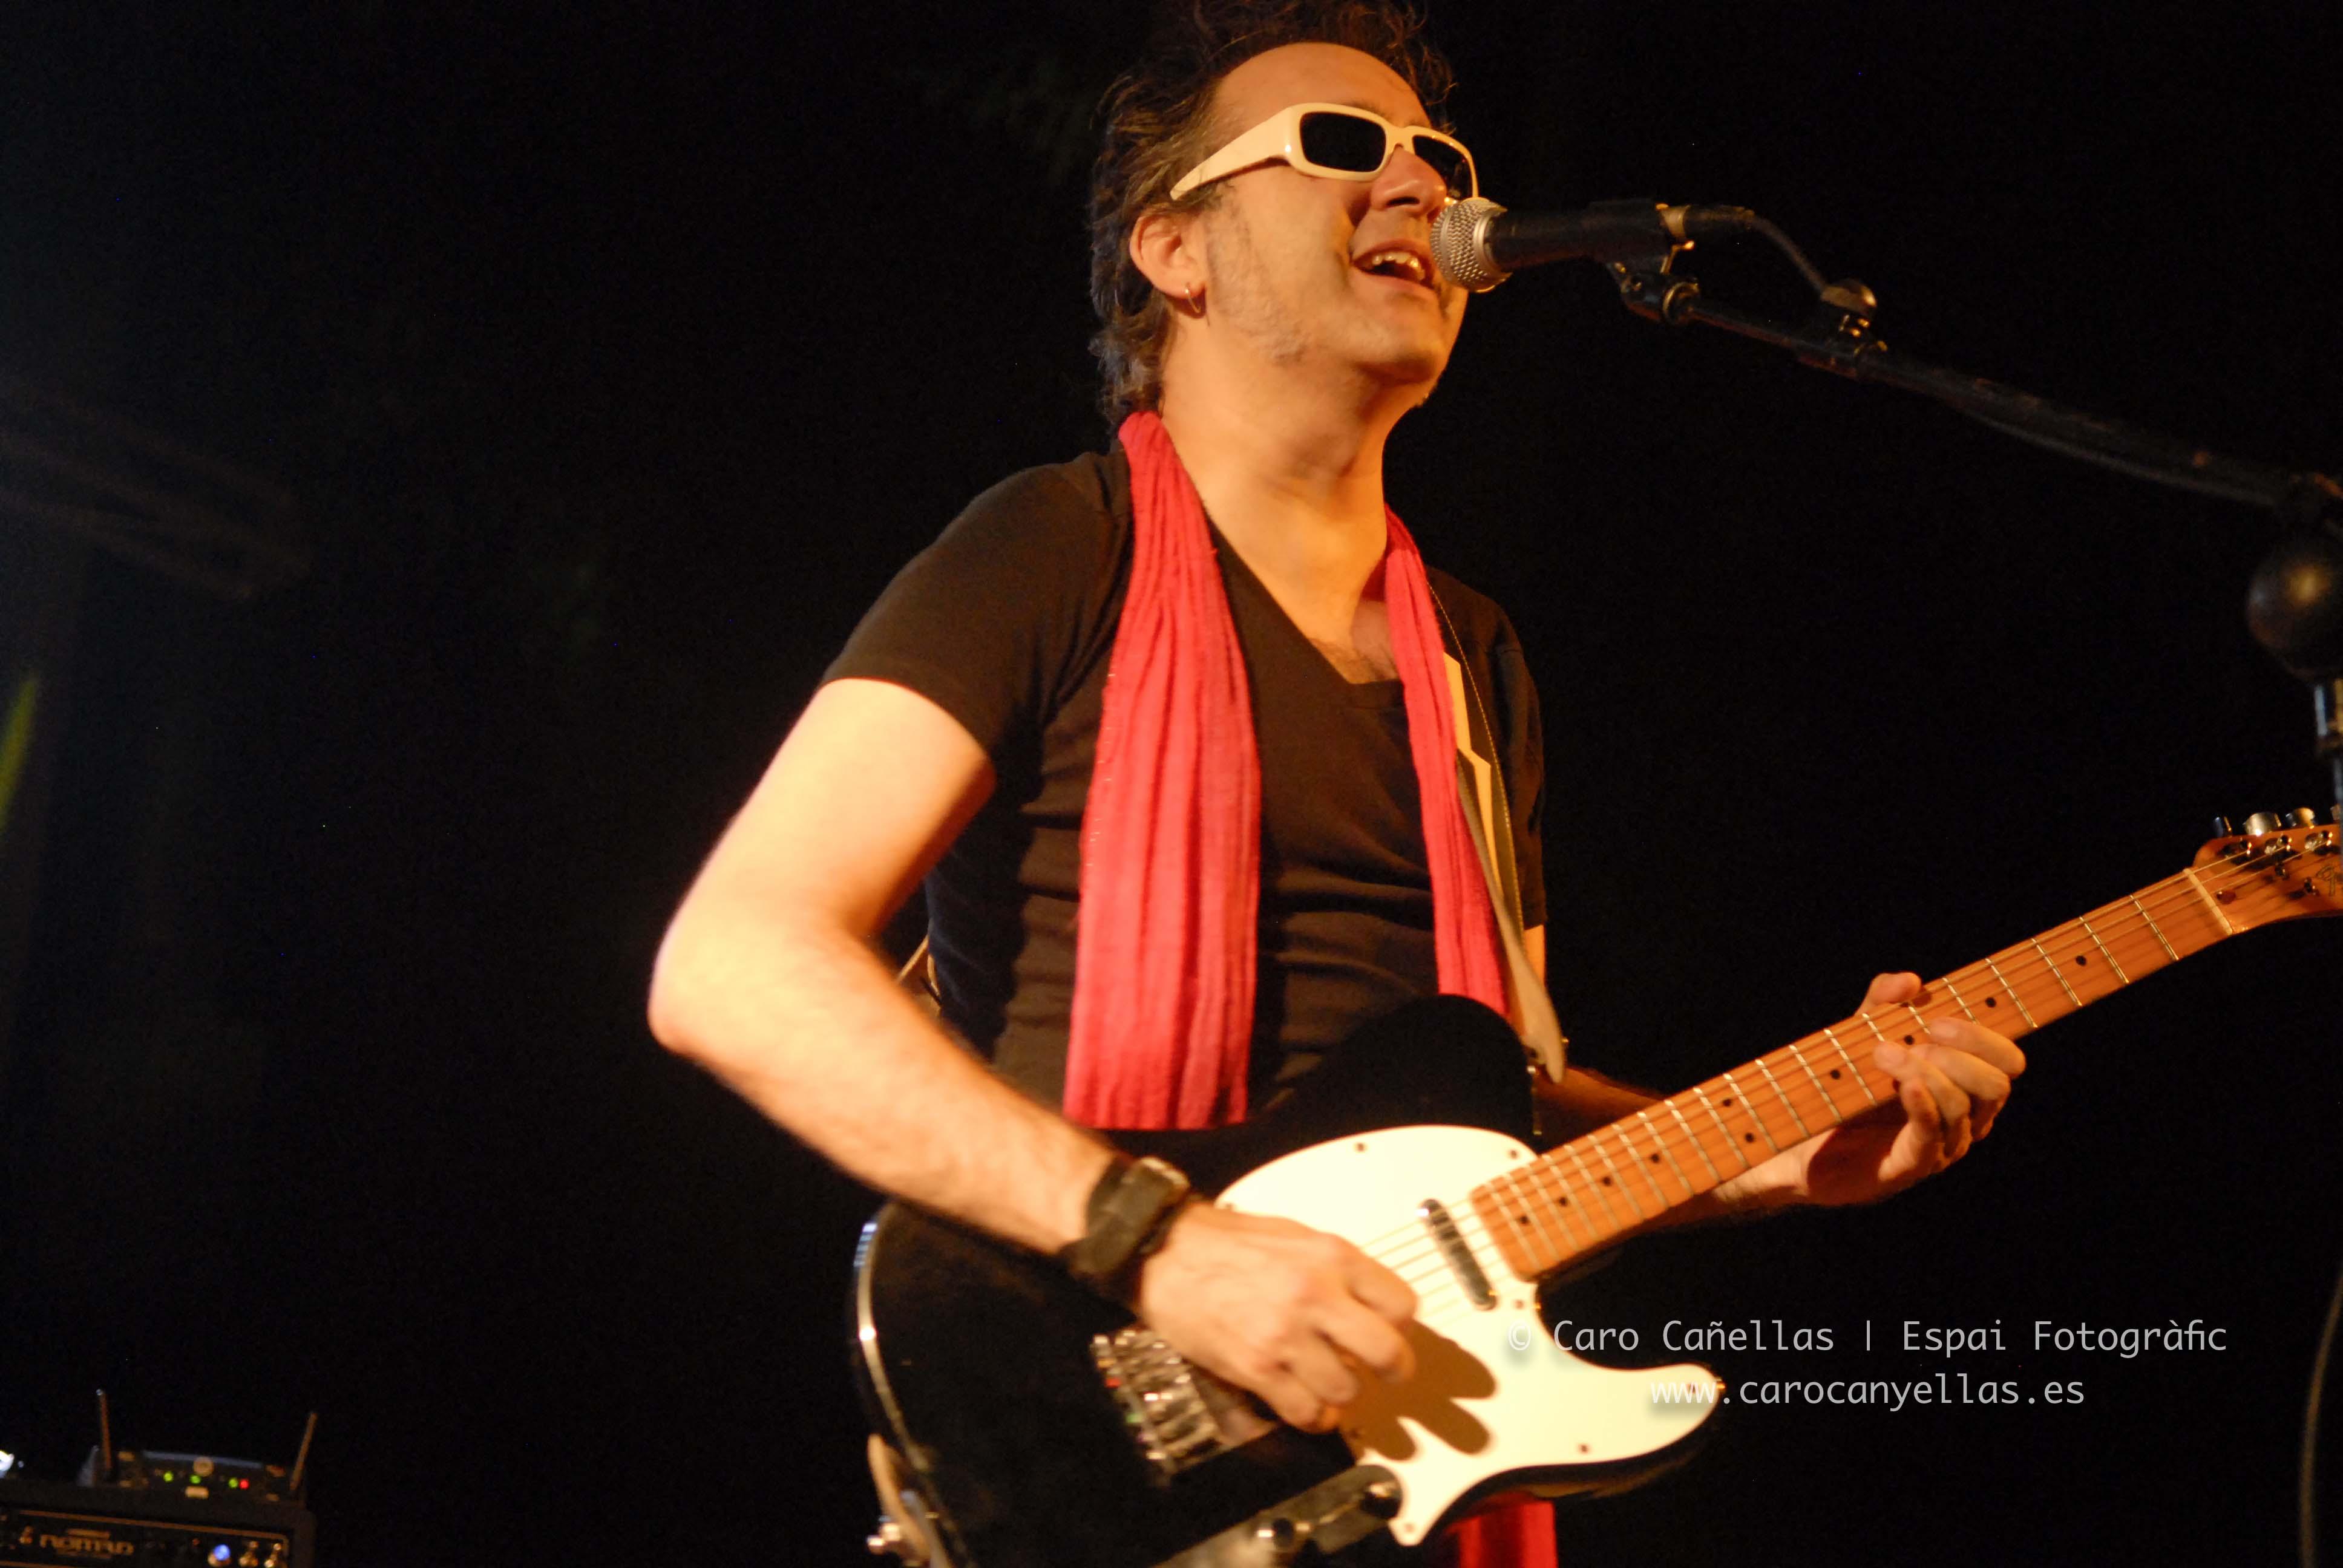 Gnaposs Groove al Pallejazz 2014